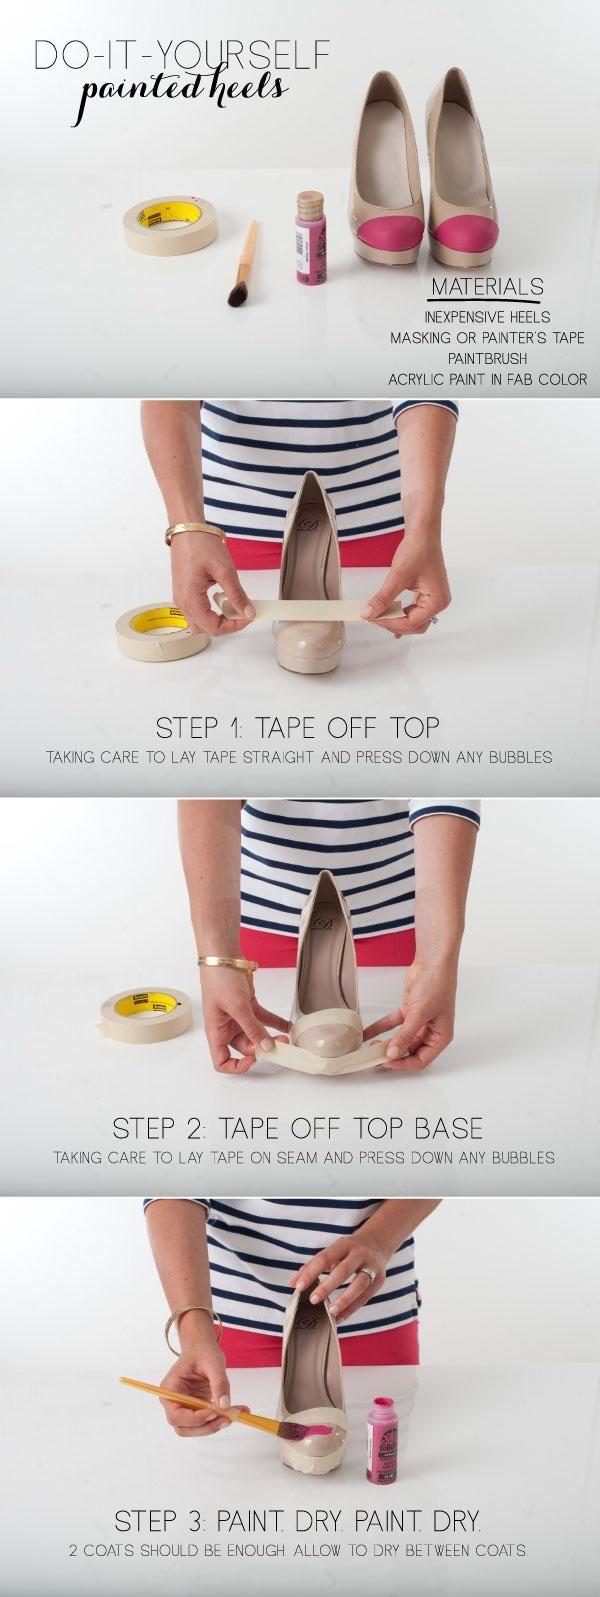 DIY Shoes Refashion: DIY Painted Shoes